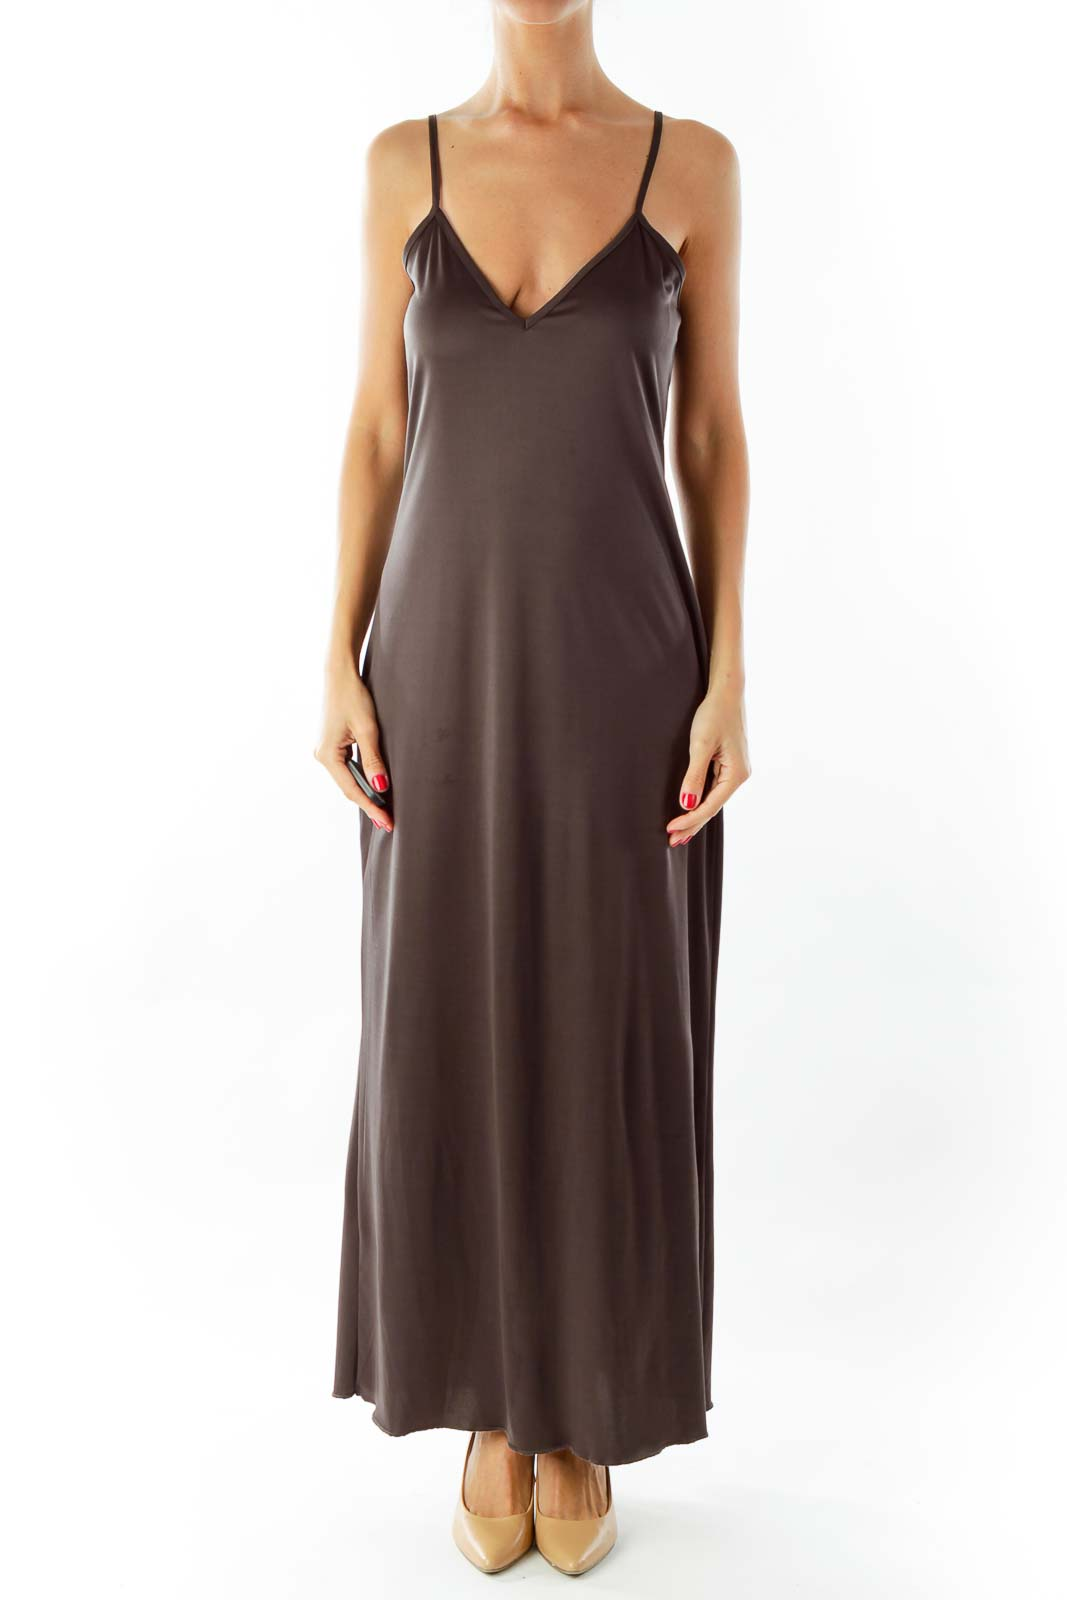 Gray Spaghetti Strap Dress Front